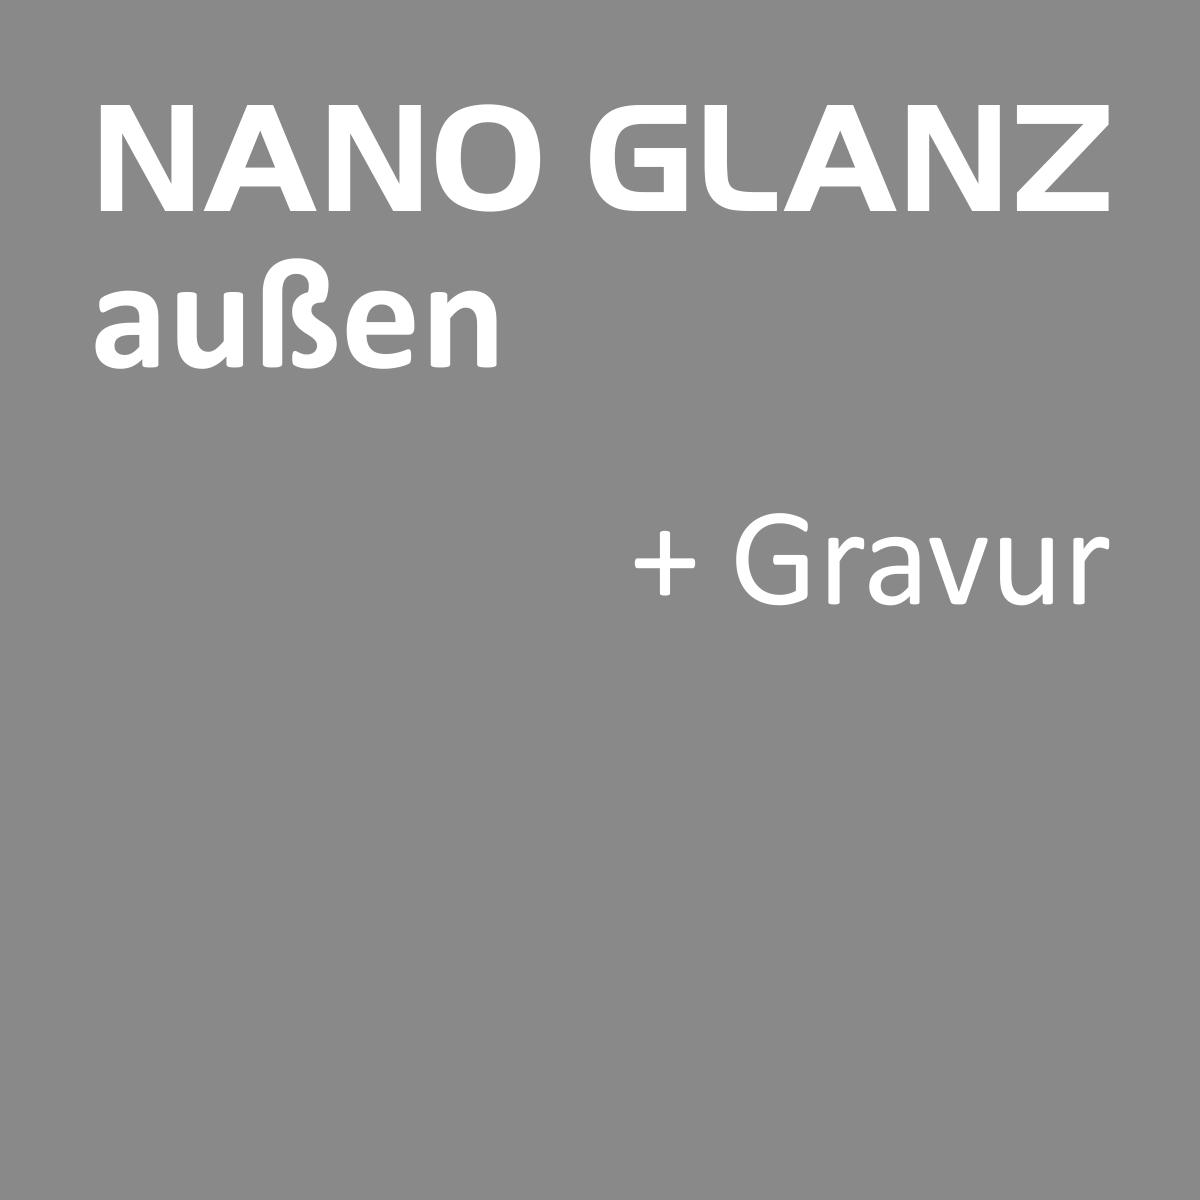 Nano Glanz_4 Text